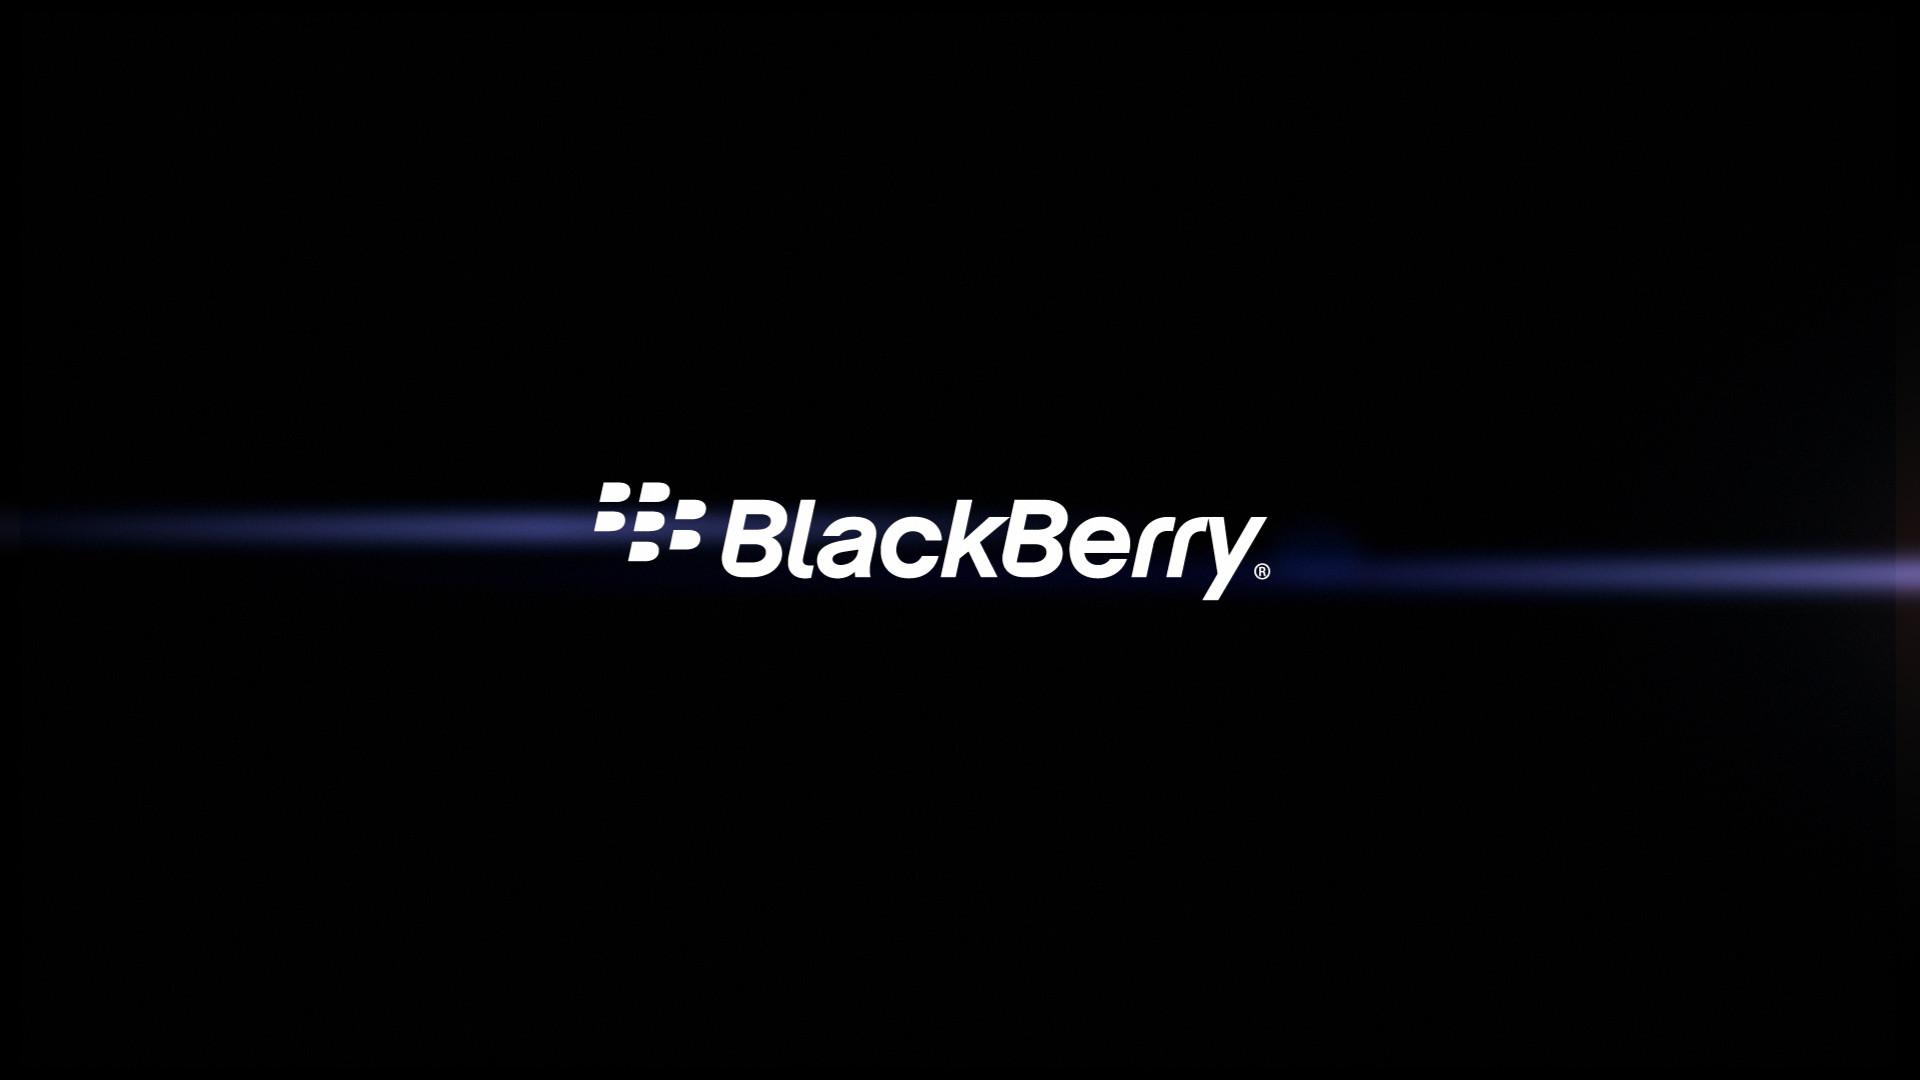 Bold Ipad Pro Wallpapers: Blackberry Logo Wallpaper HD (66+ Images